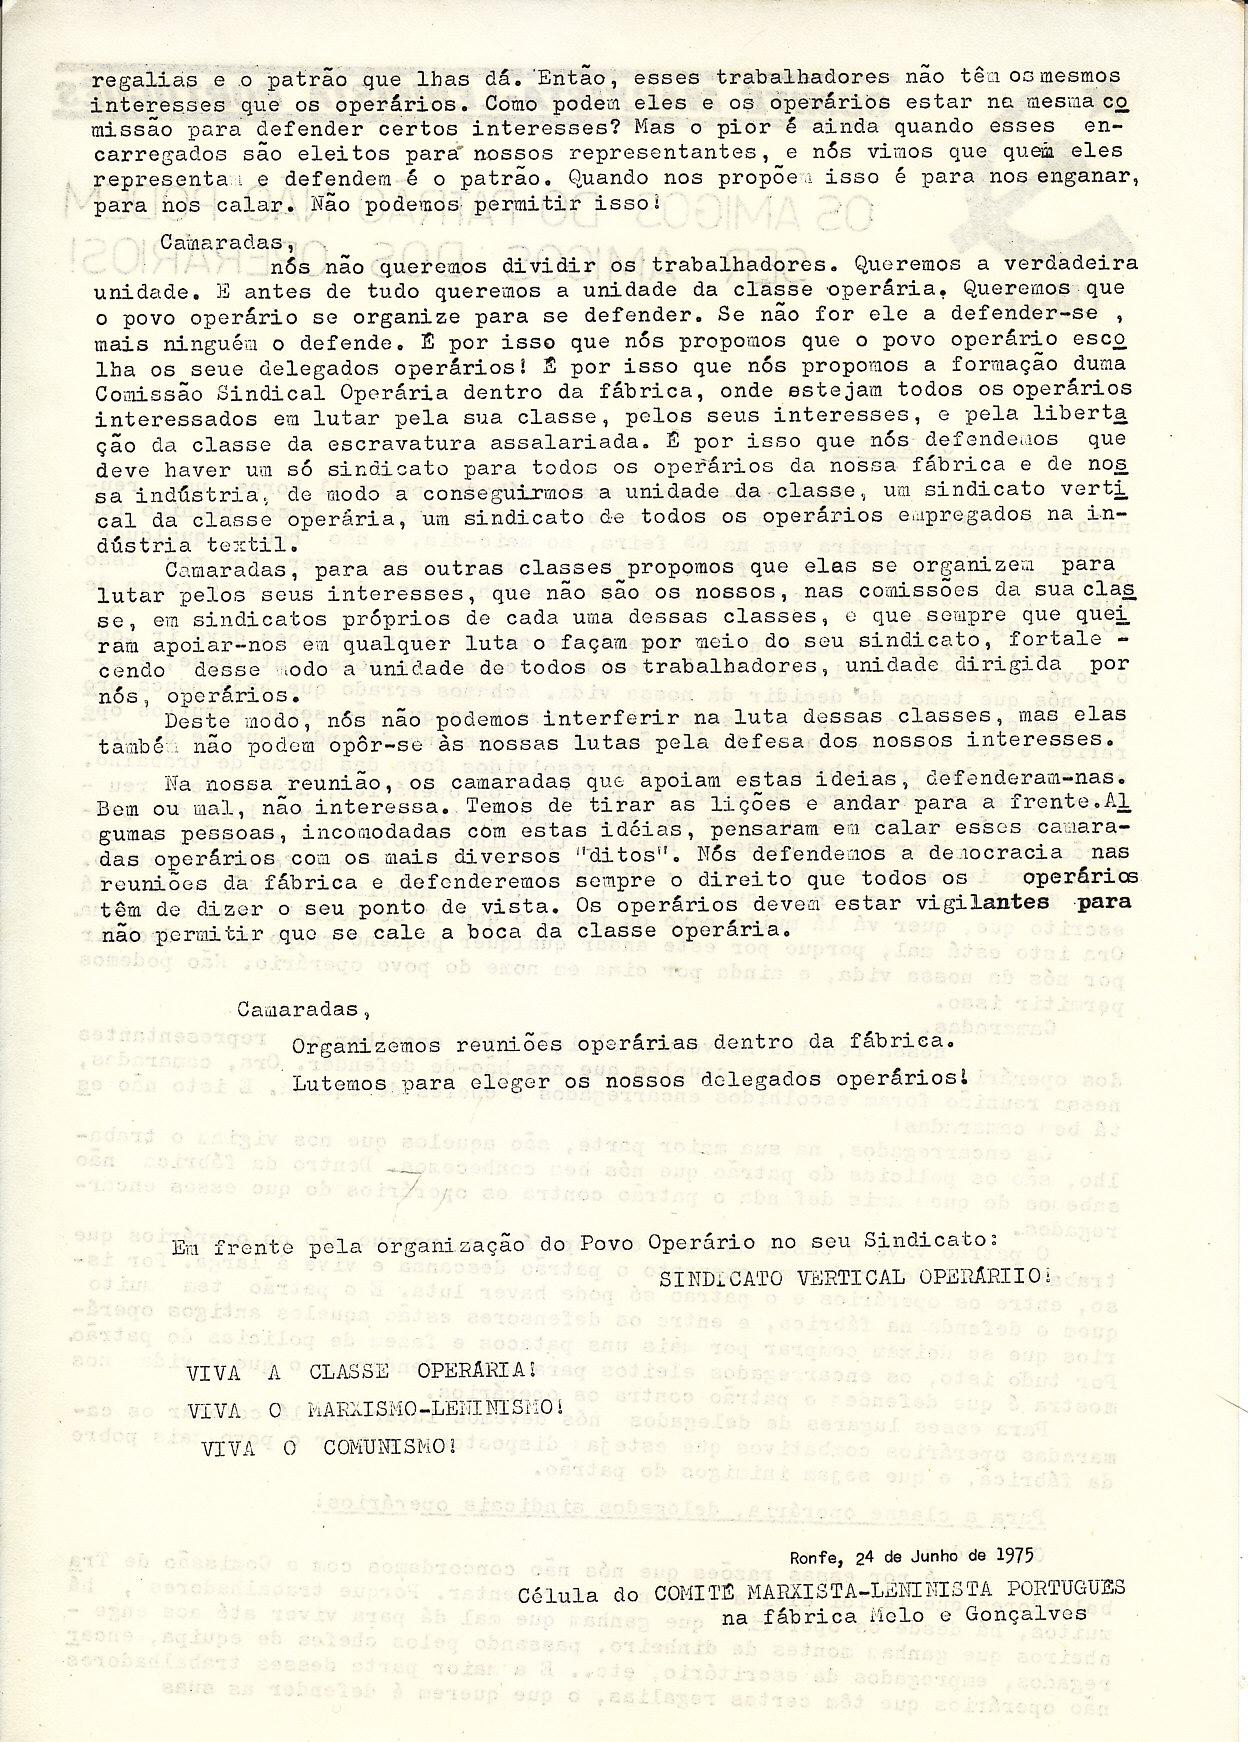 CMLP_Melo&Goncalves_24-6-1975_0002